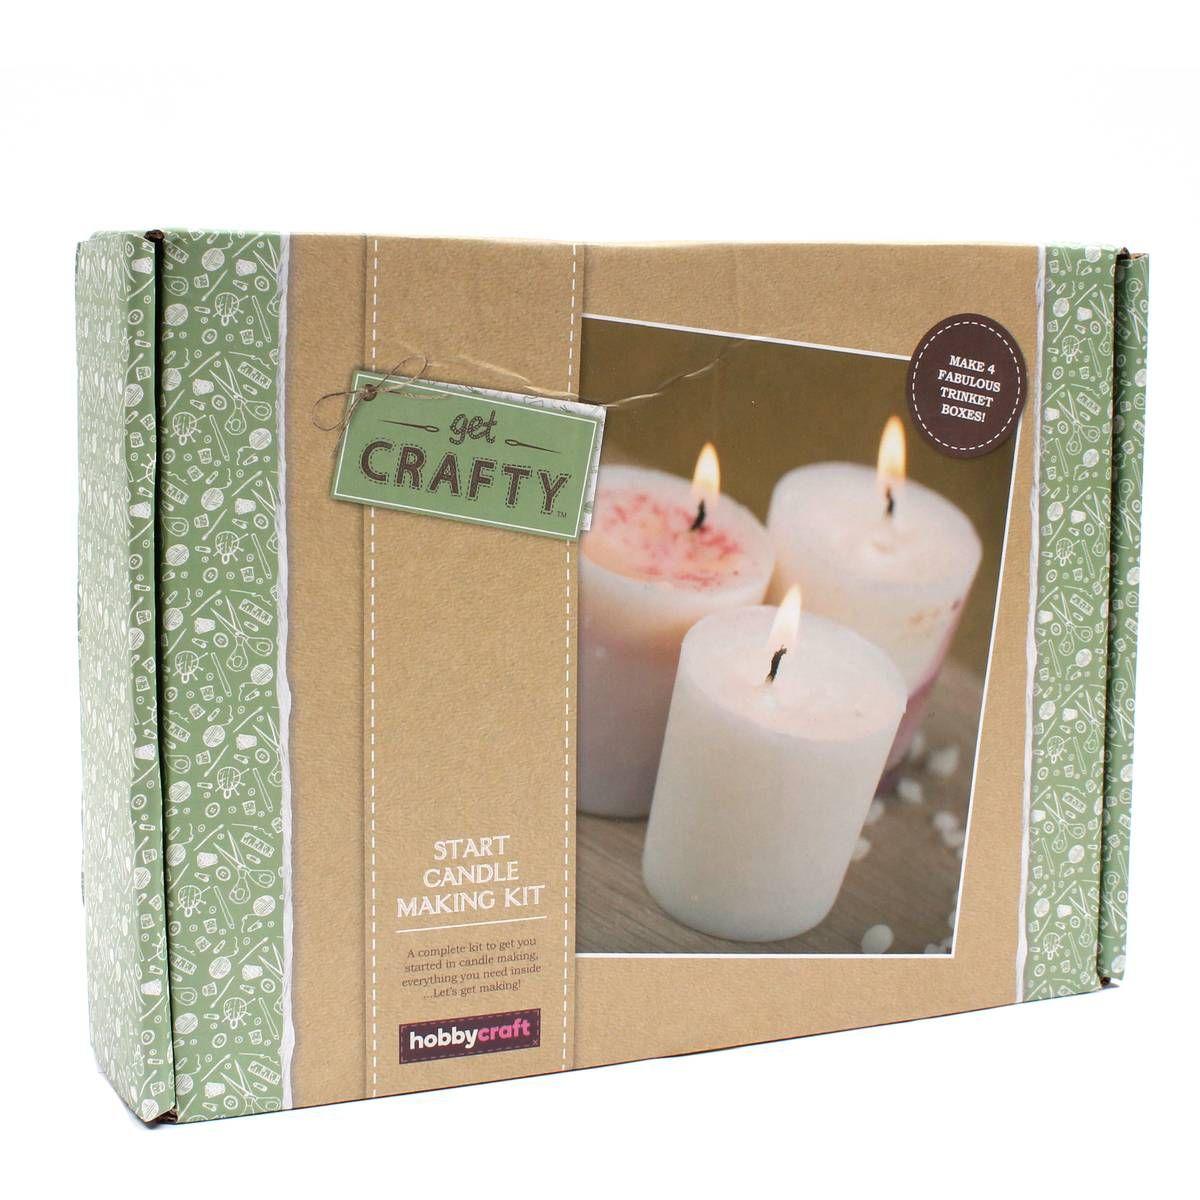 Get Crafty Start Candle Making Kit Hobbycraft Candle